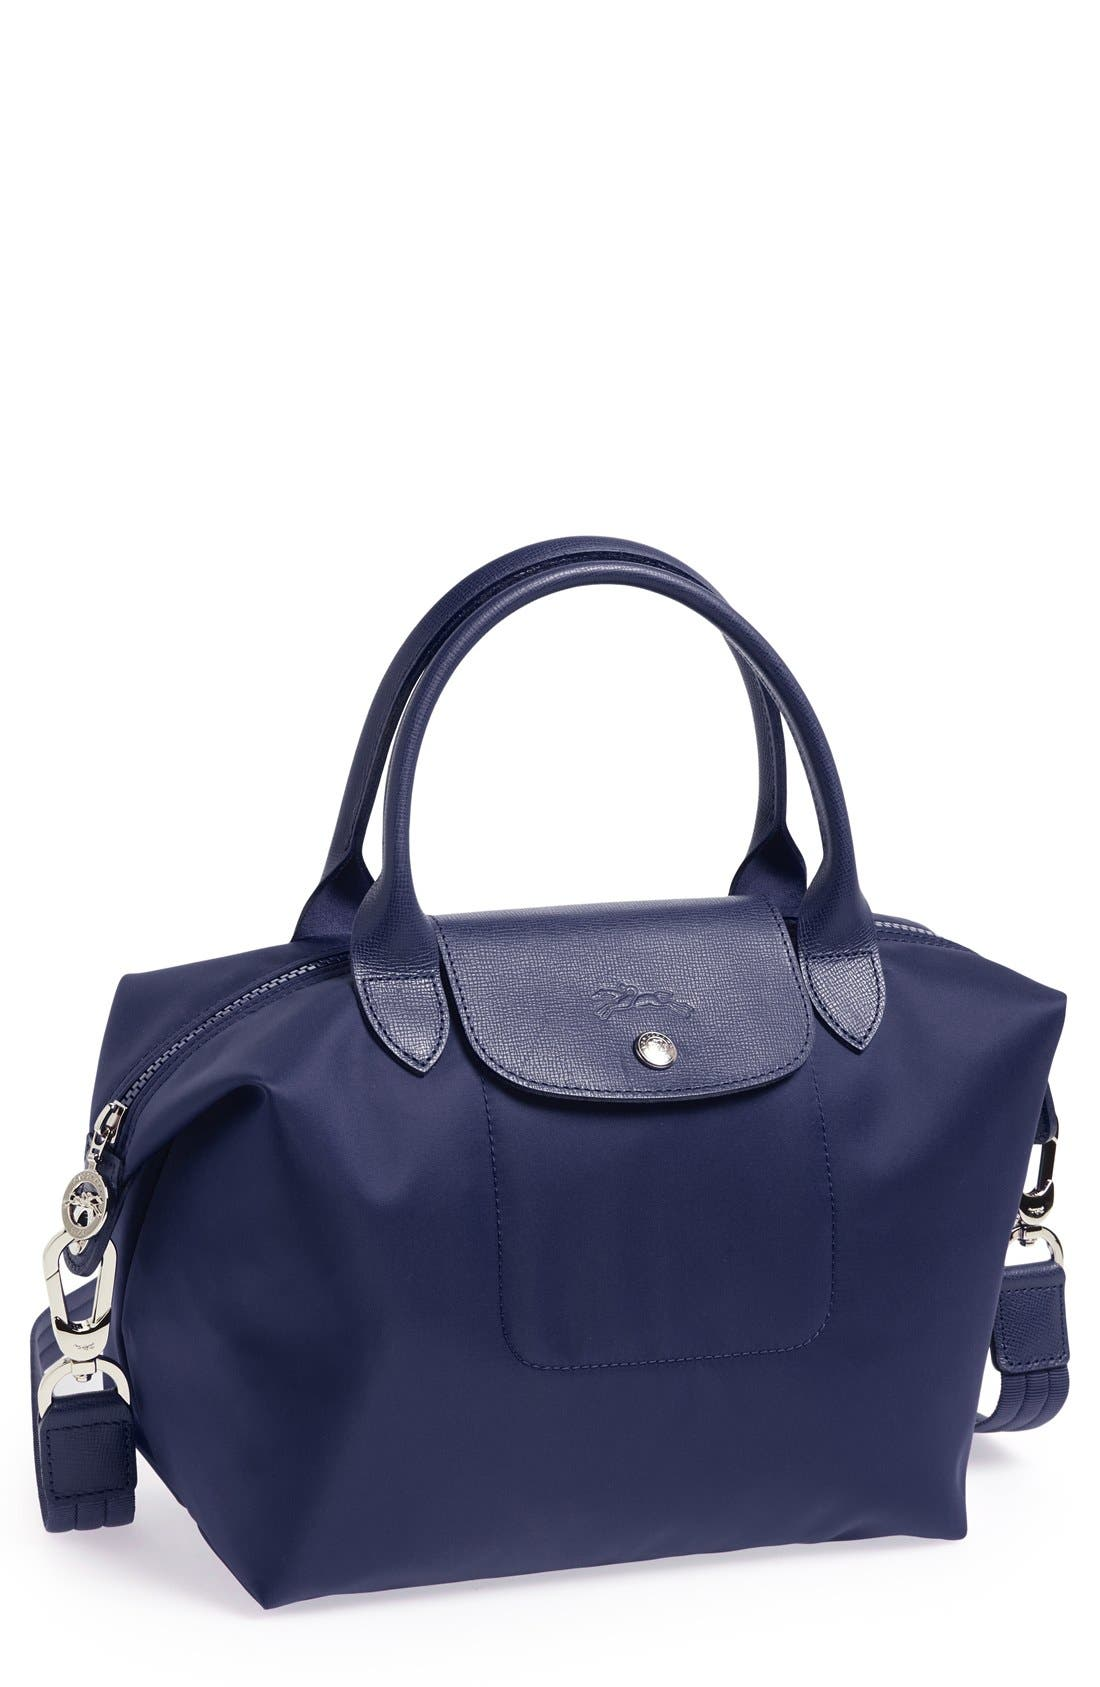 Main Image - Longchamp 'Small Le Pliage Neo' Nylon Tote